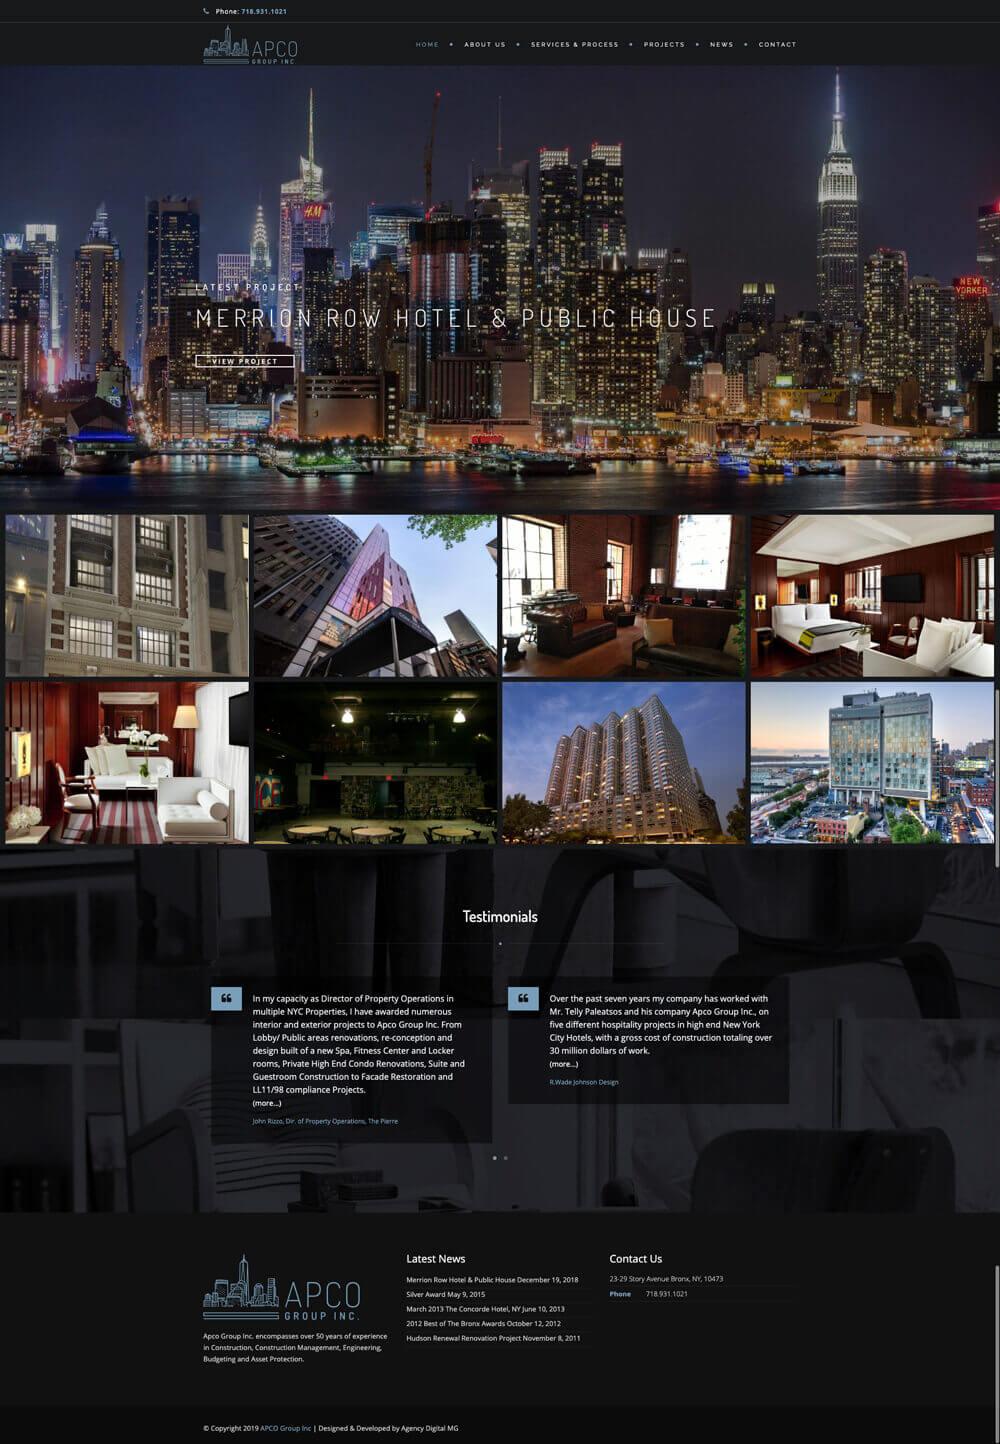 Apco Project - Online Marketing